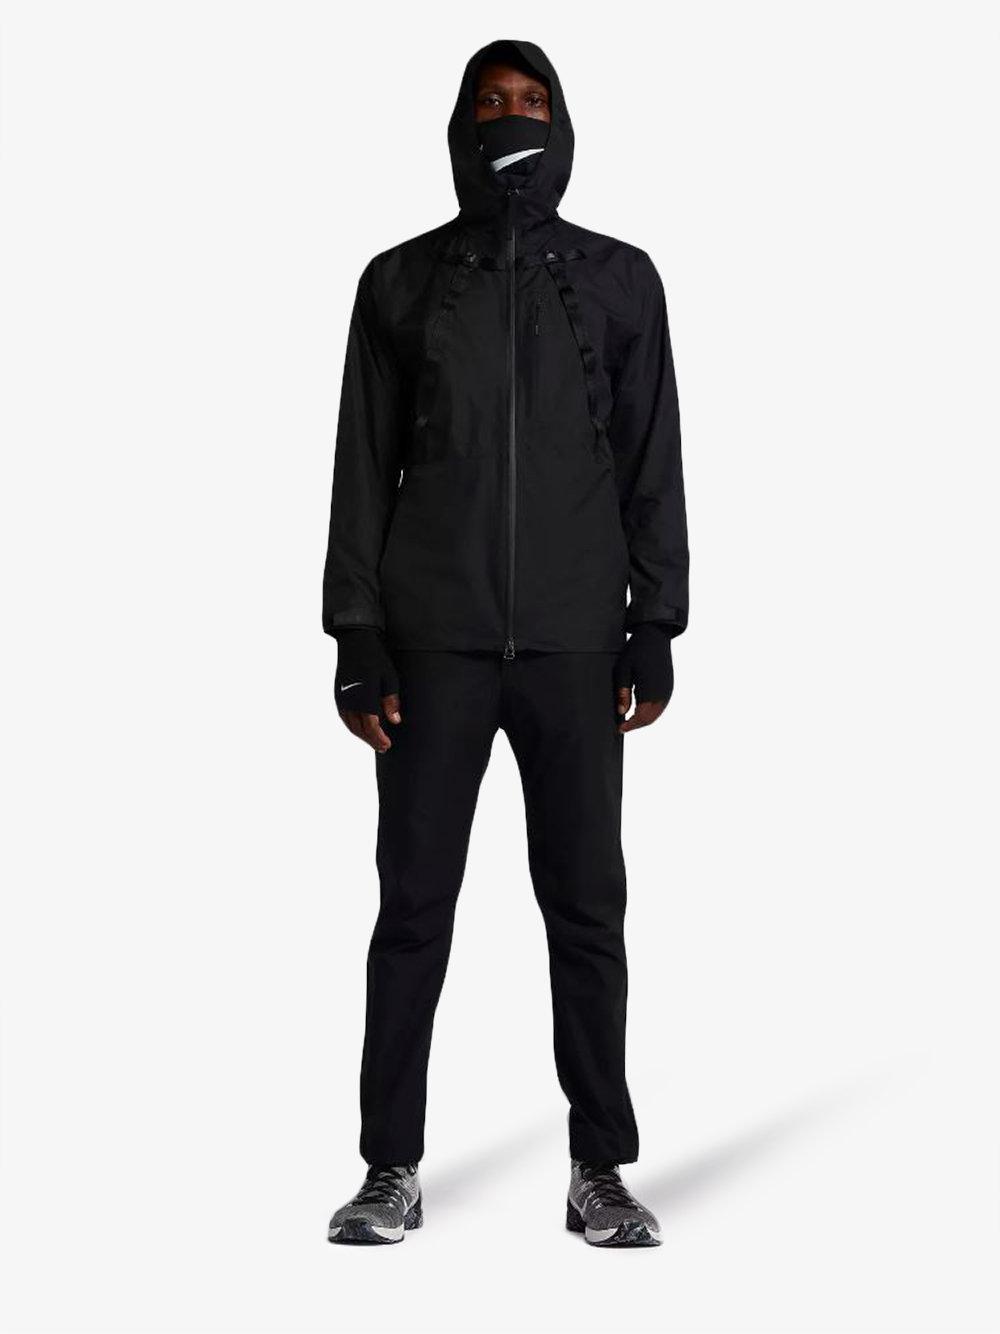 f869b911 Nike X Mmw Face Mask Jacket in Black for Men - Lyst